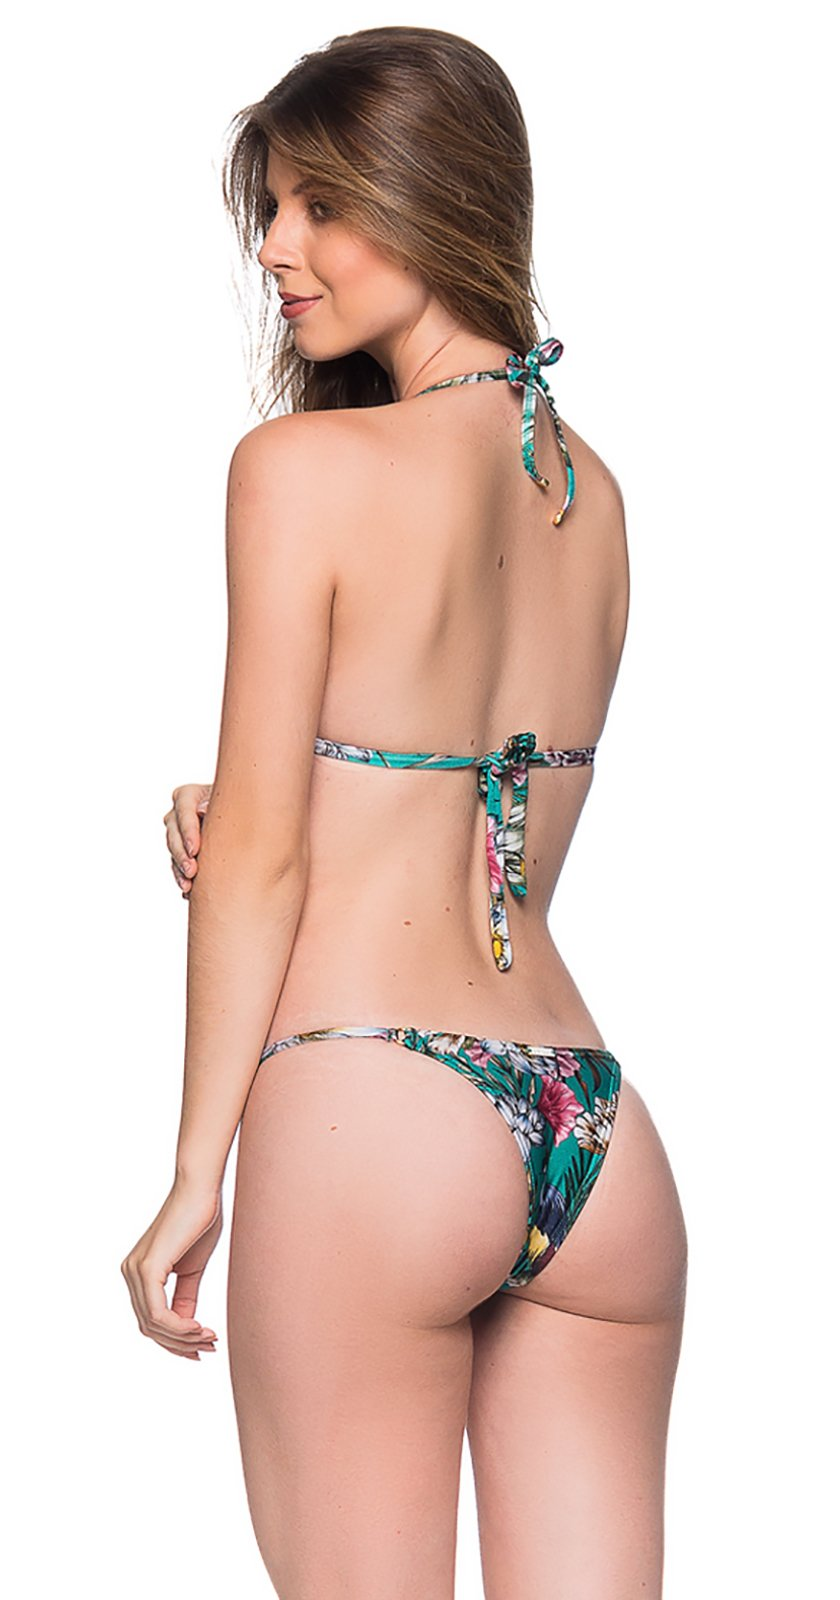 3e3b3cc27d ... Green floral triangle push-up bikini with adjustable bottom - CORTINAO TROPICAL  GARDEN